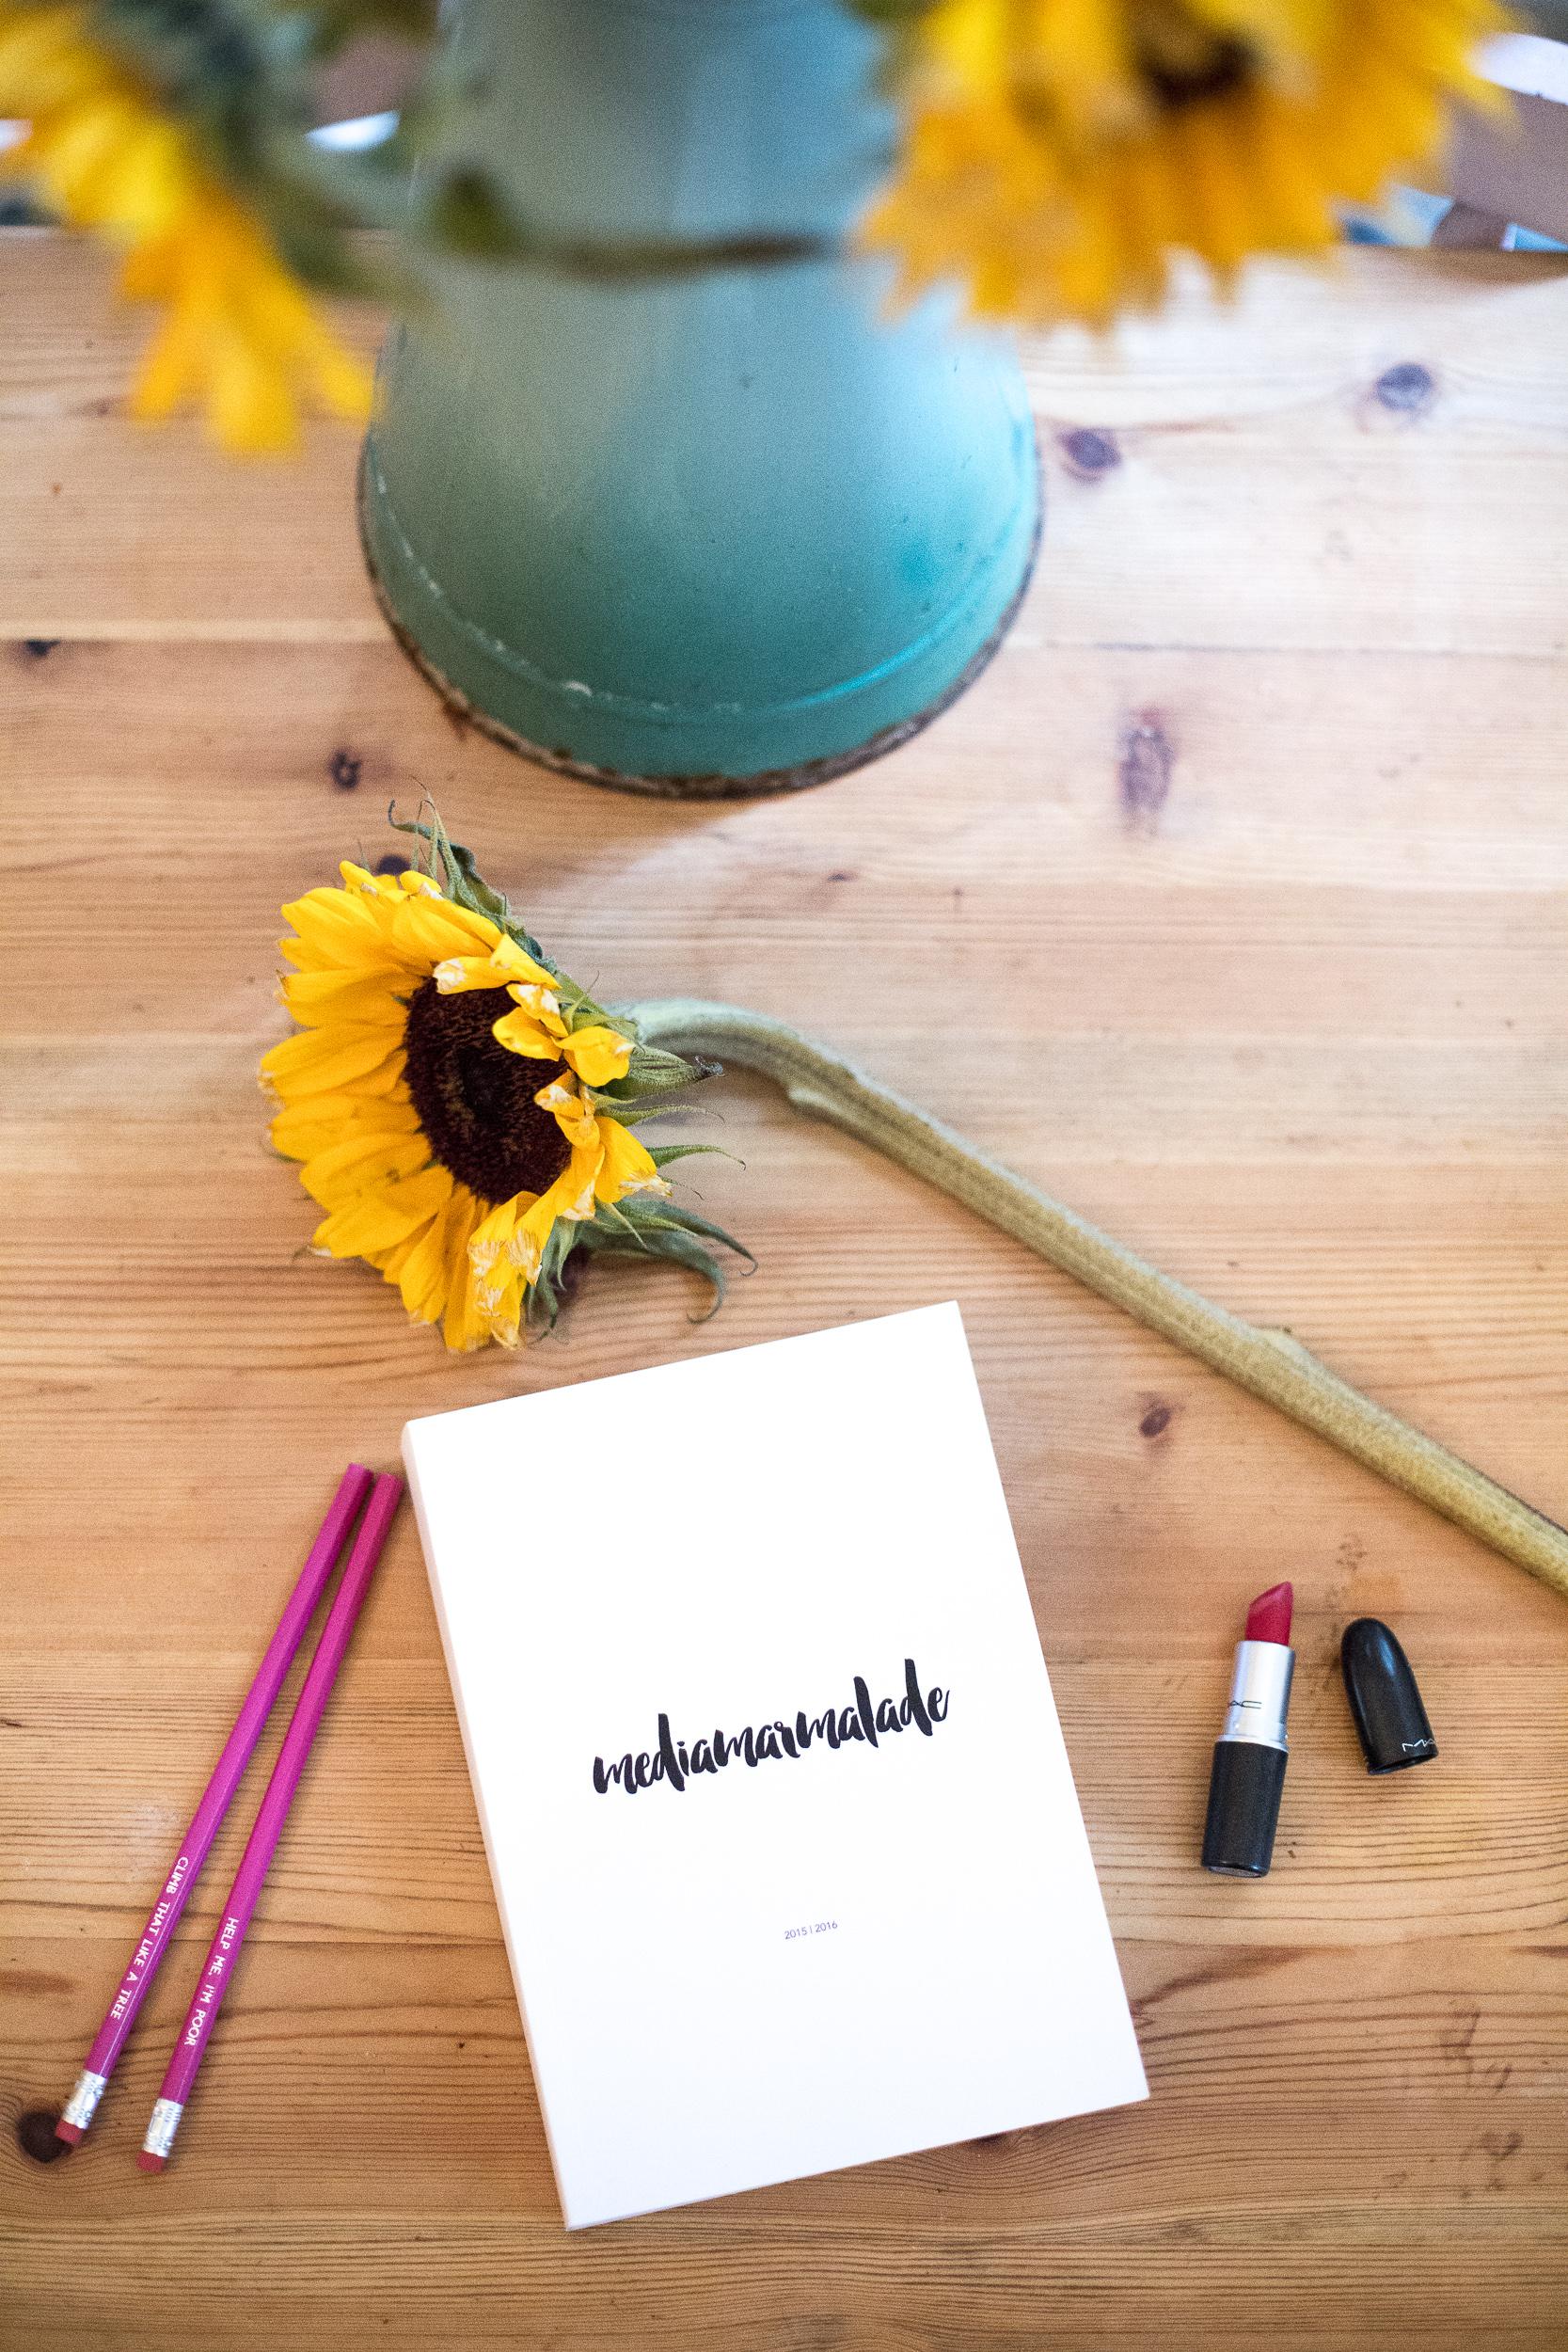 Mediamarmamalade Blog Planner